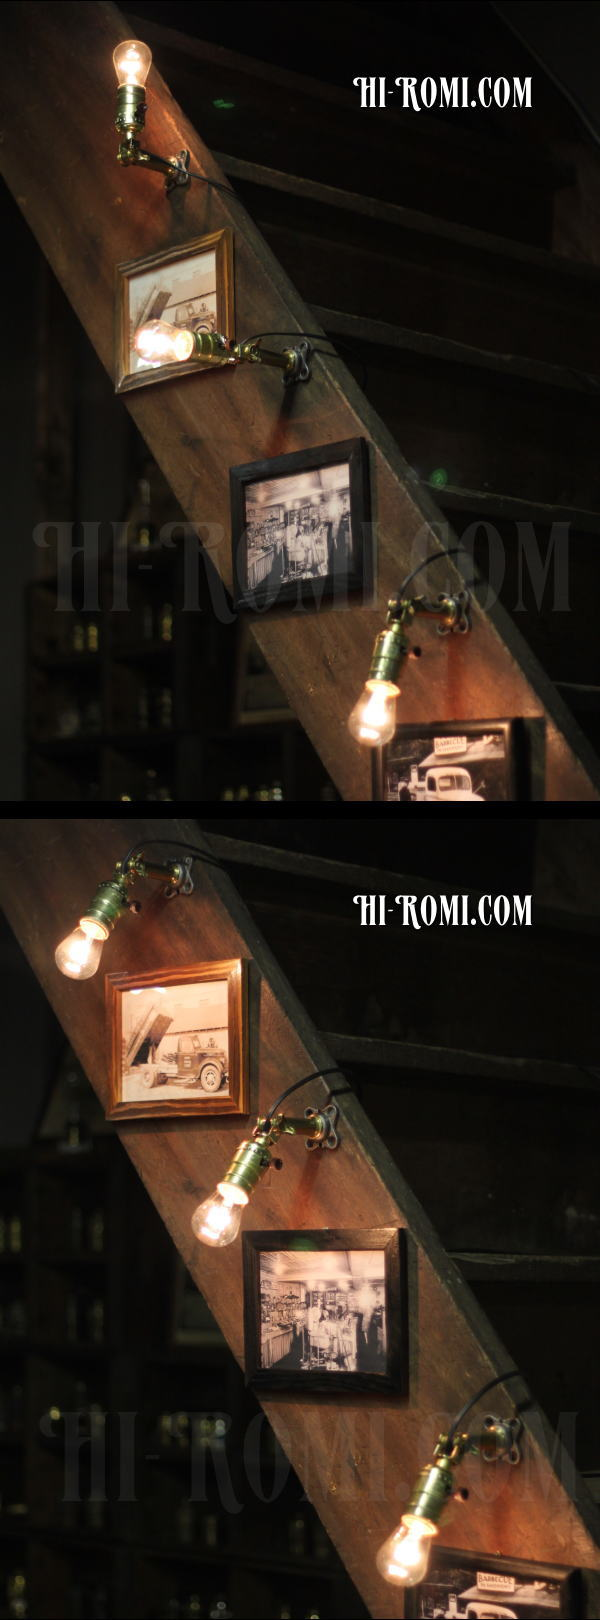 USAヴィンテージ工業系角度調整付壁掛ライトA/アンティークアトリエ照明 アンティーク照明&雑貨 Hi-Romi.com 神戸